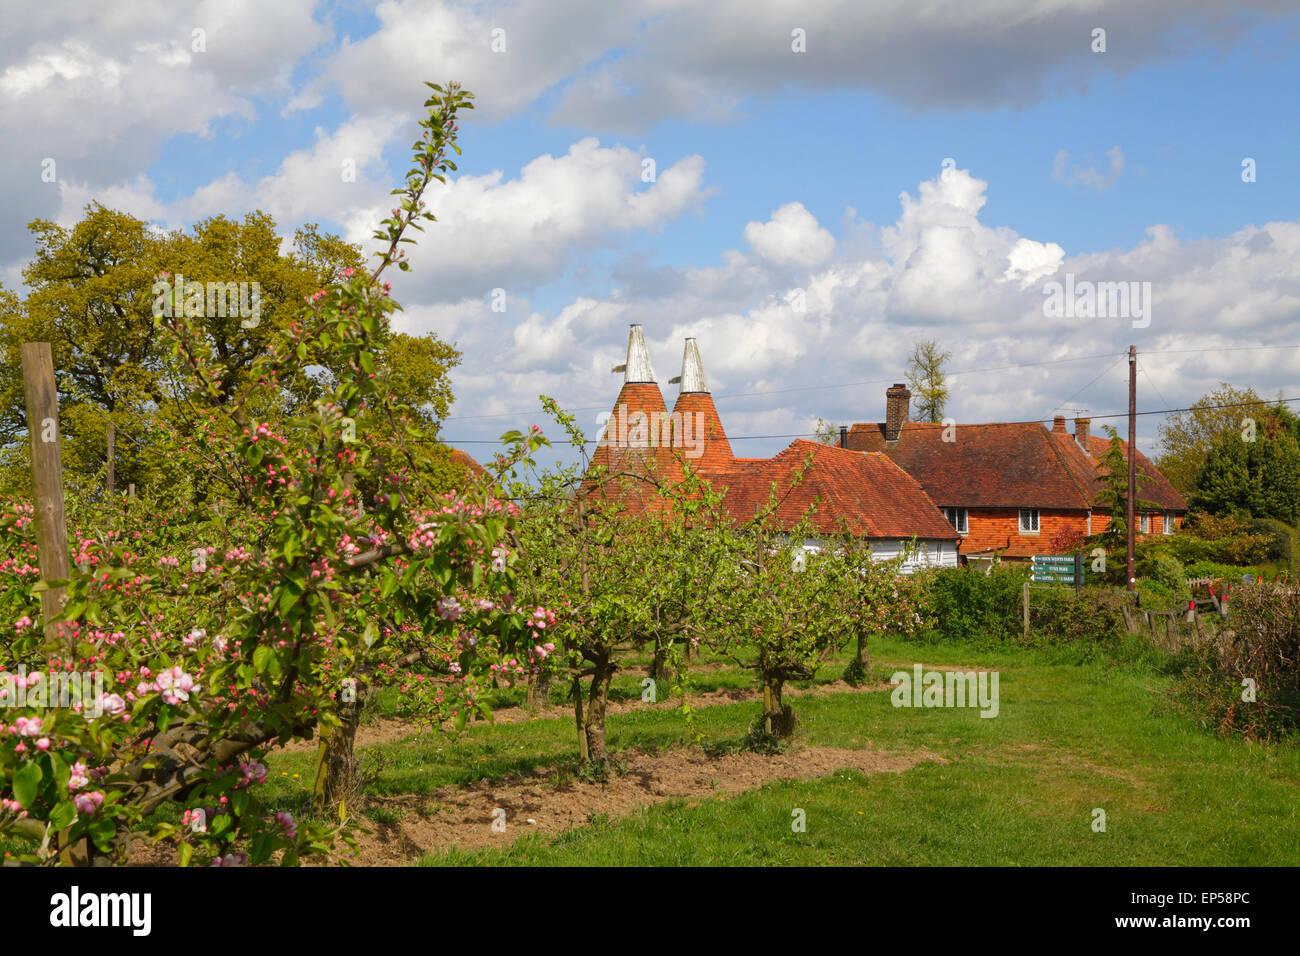 Oast Häuser und Apple Blossom Kent, Großbritannien, England, Großbritannien, GB Stockbild